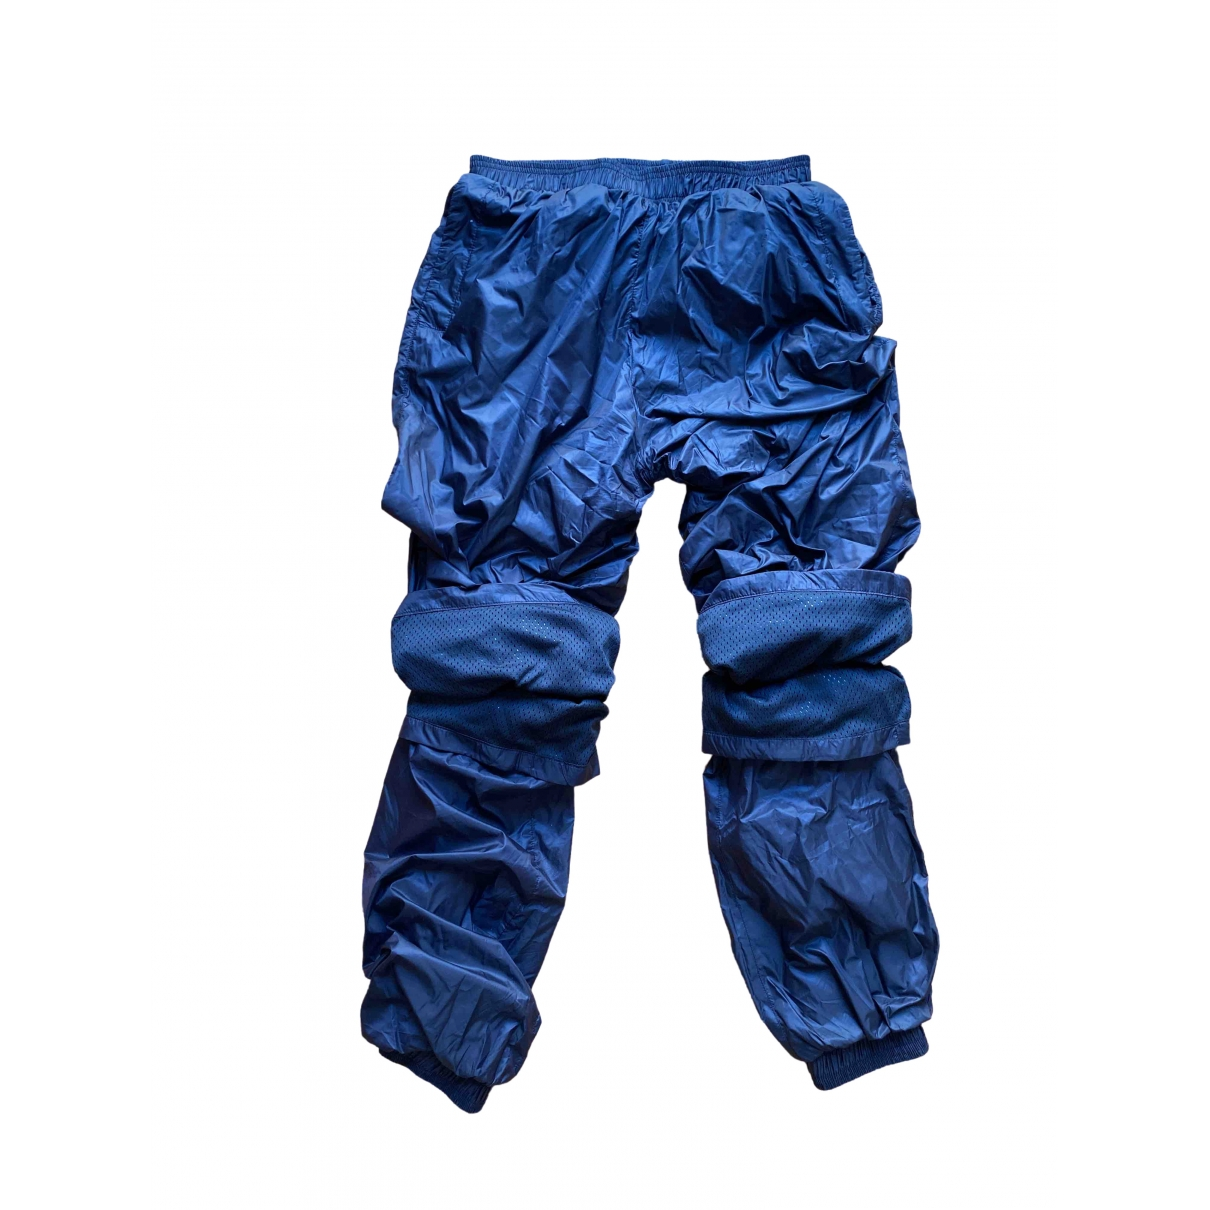 Y/project \N Black Trousers for Men XS International